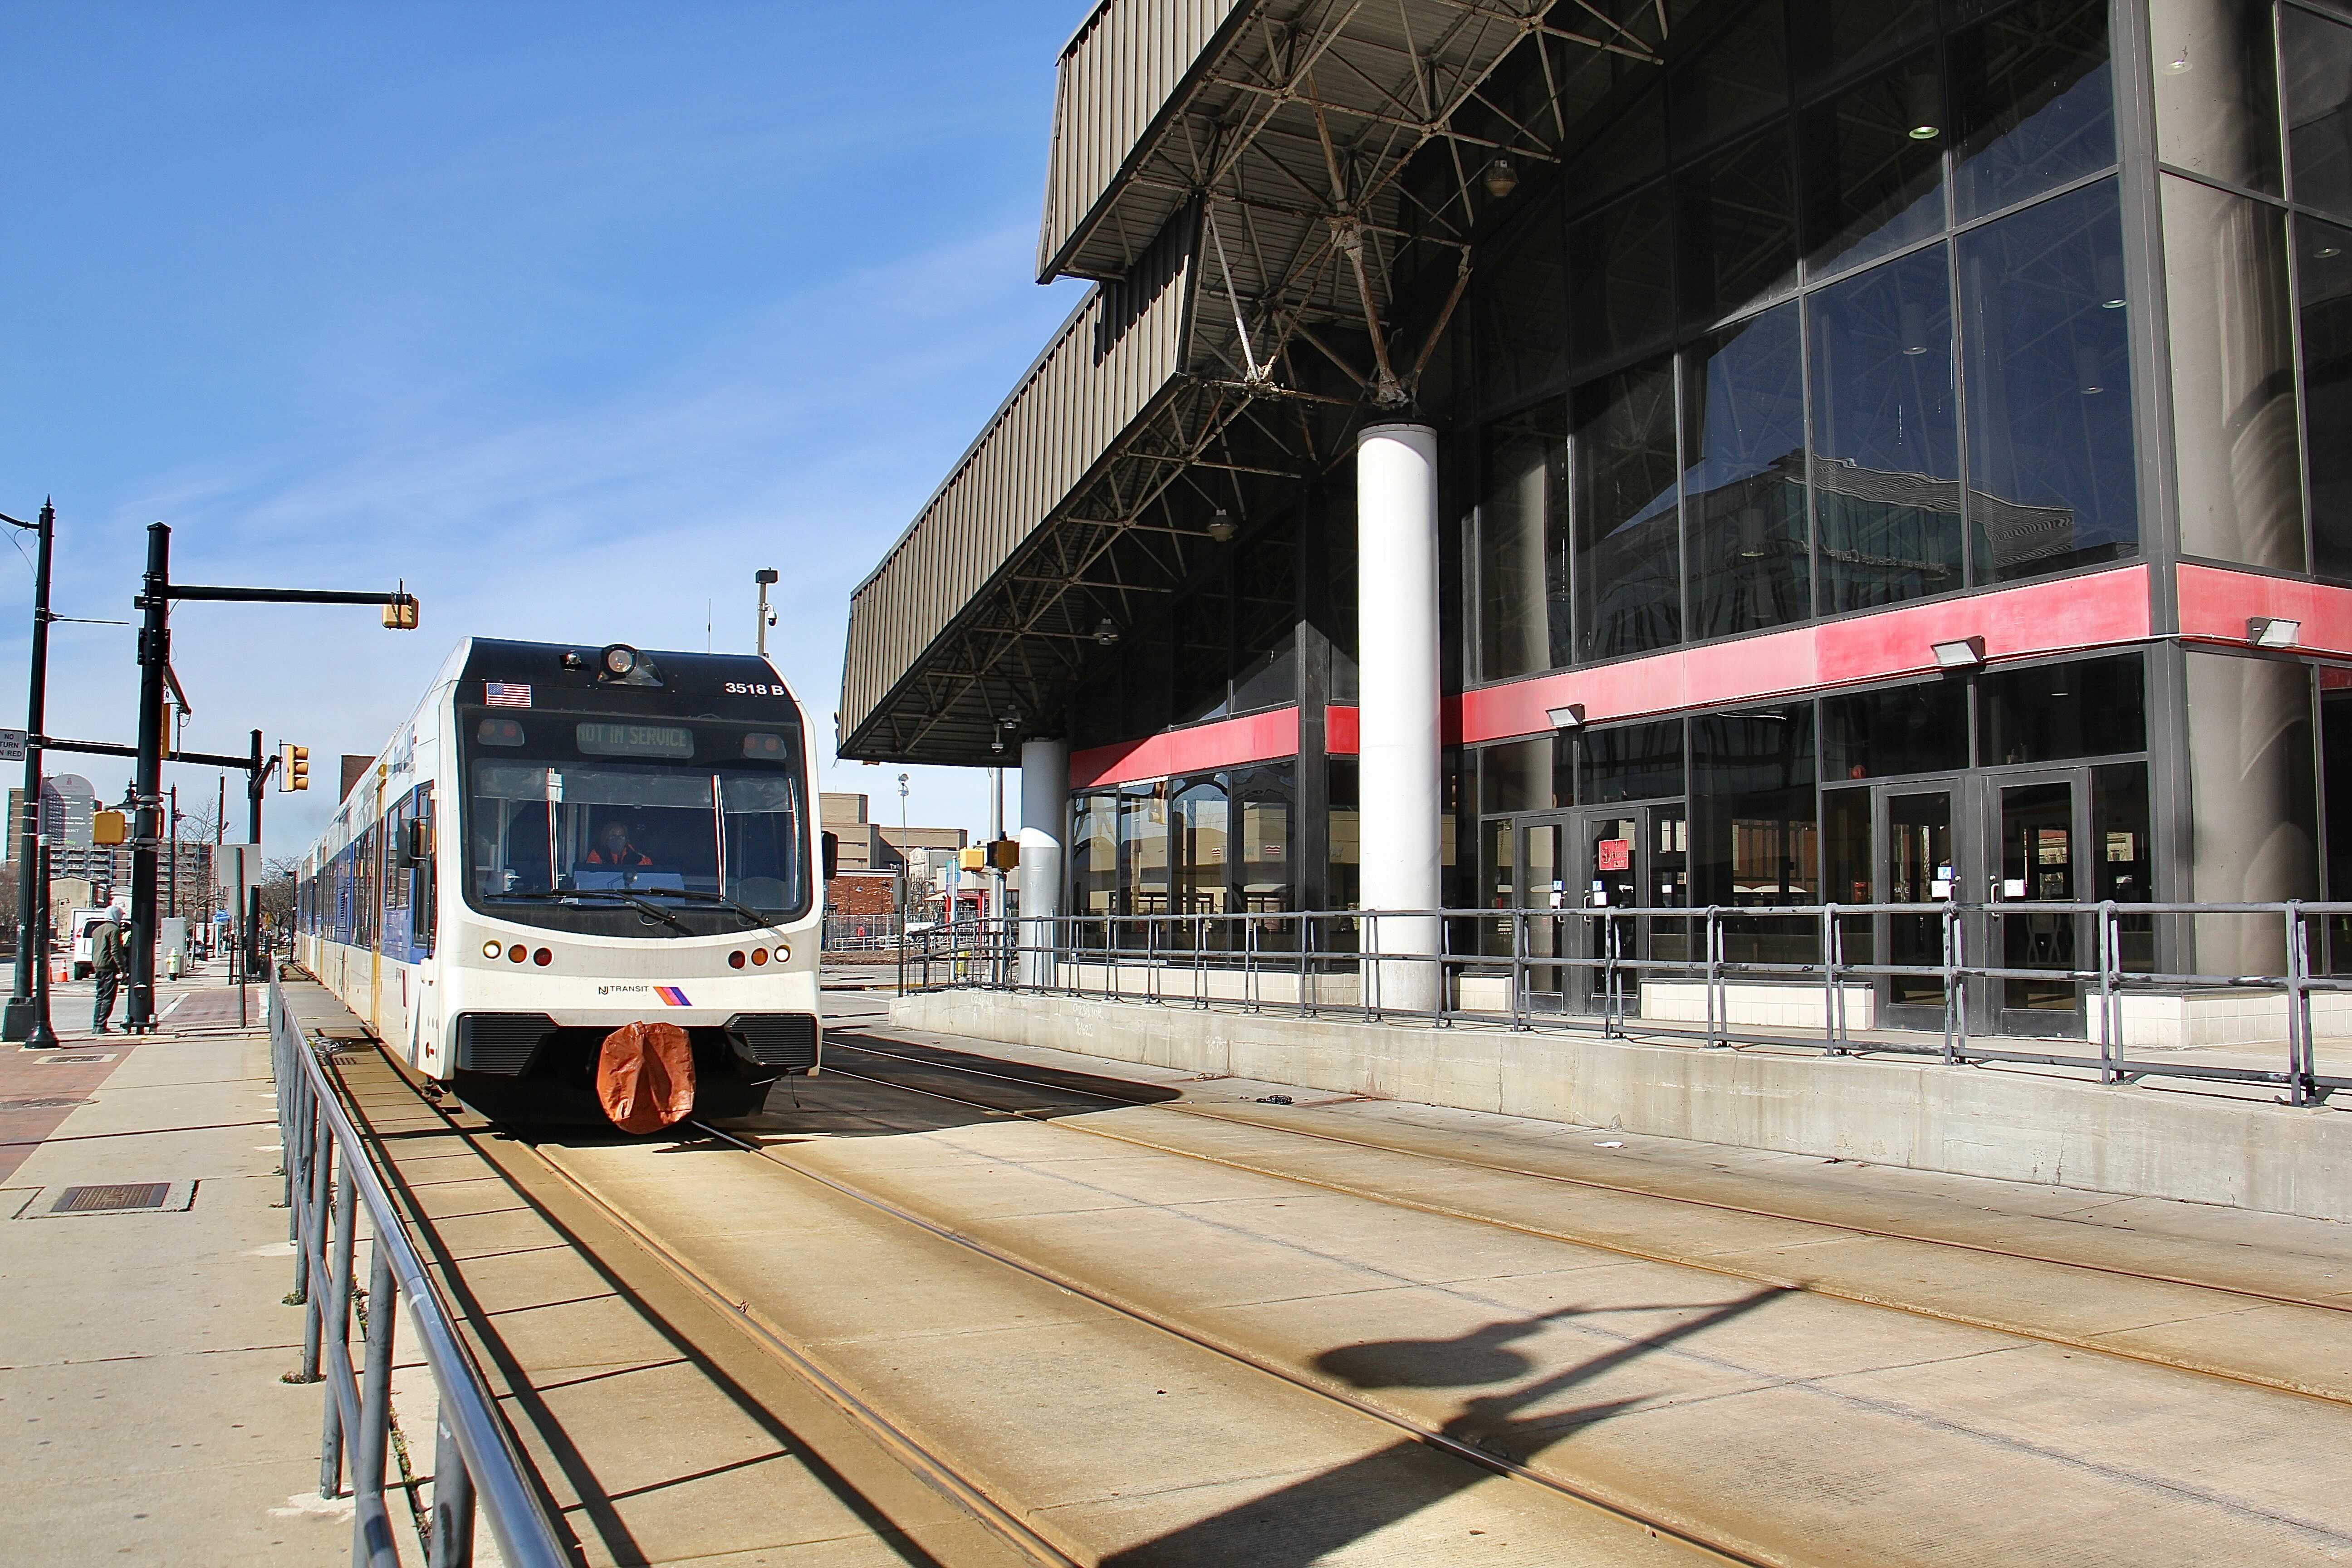 A Riverline train passes the Walter Rand Transportation Center in Camden